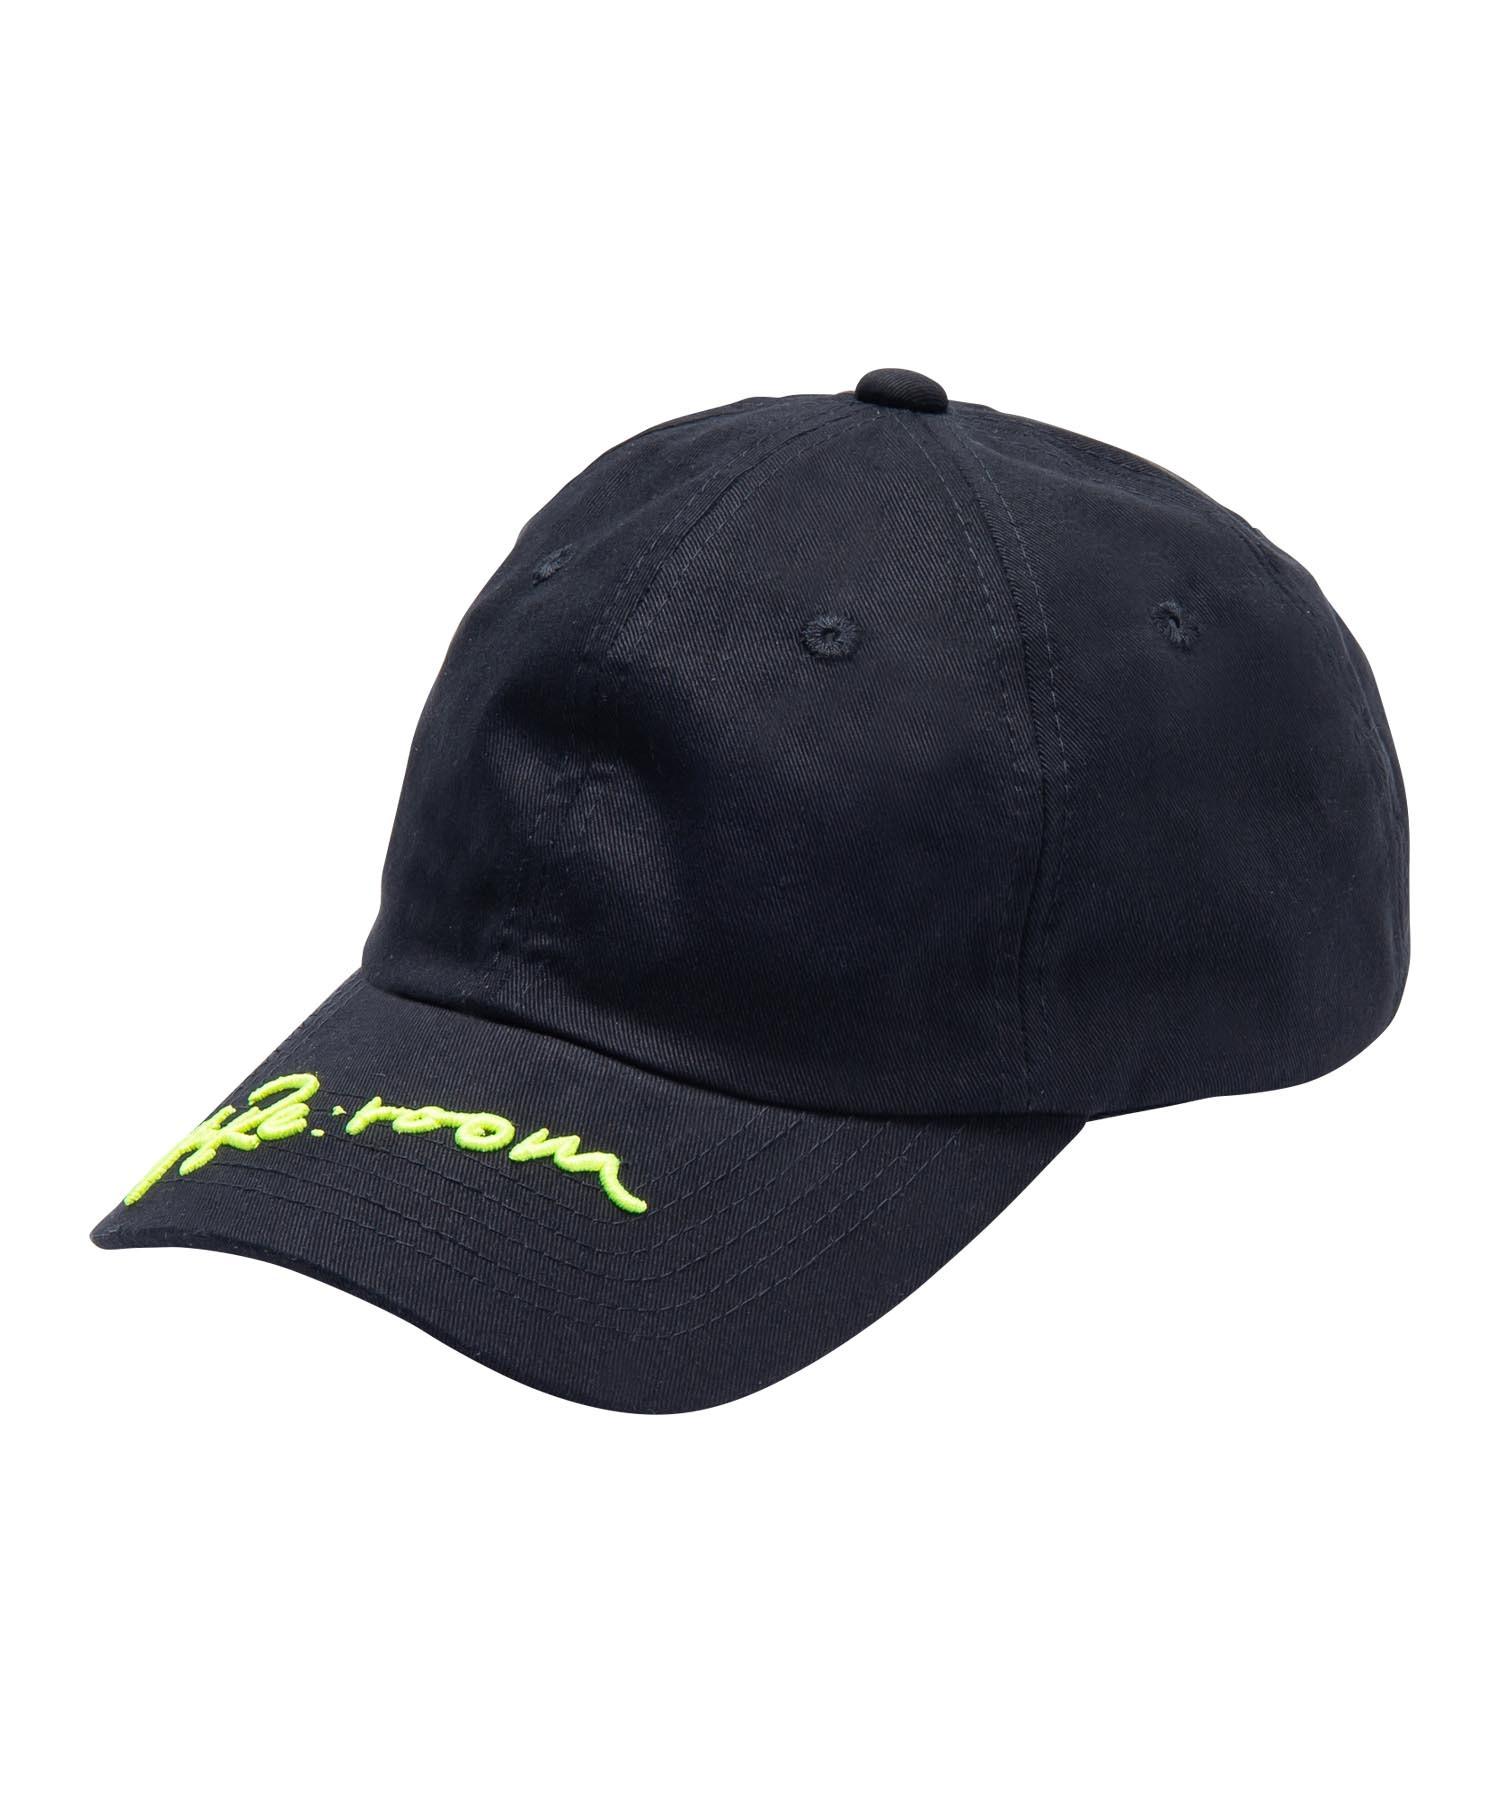 EMBROIDERY VISOR 3D LOGO TWILL CAP[REH090]